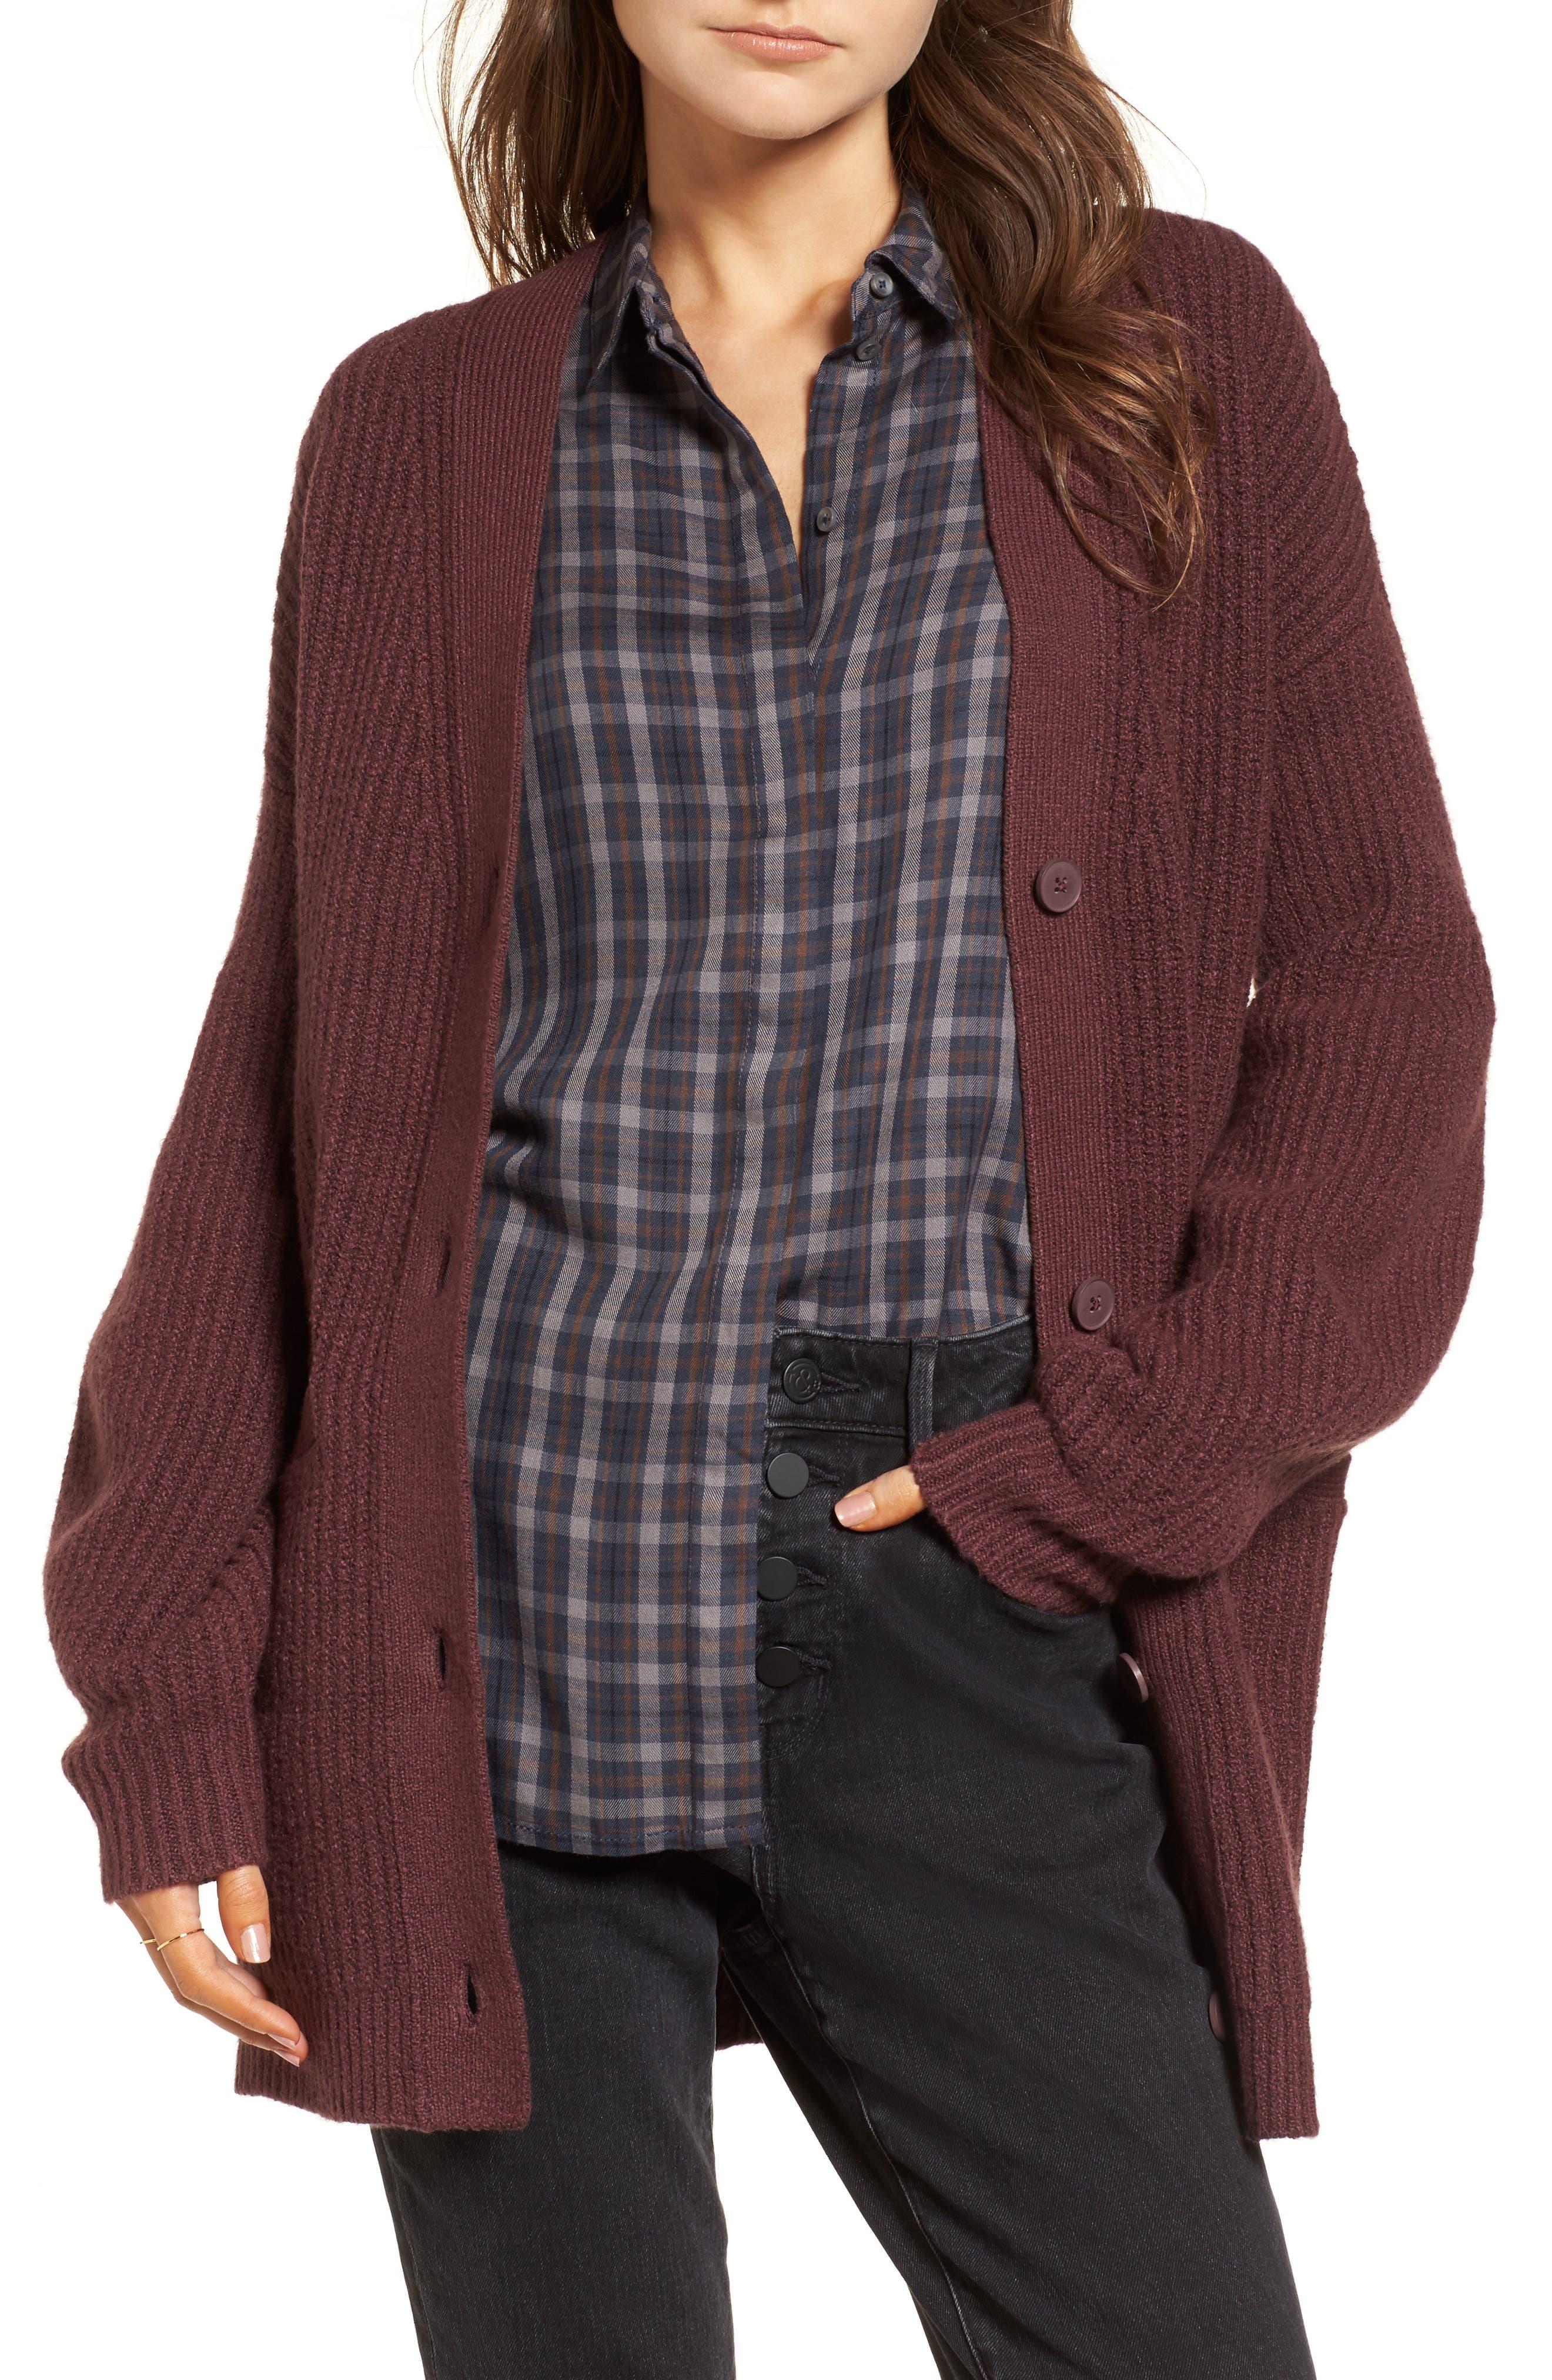 Ribbed Cardigan Sweater,                             Main thumbnail 1, color,                             930